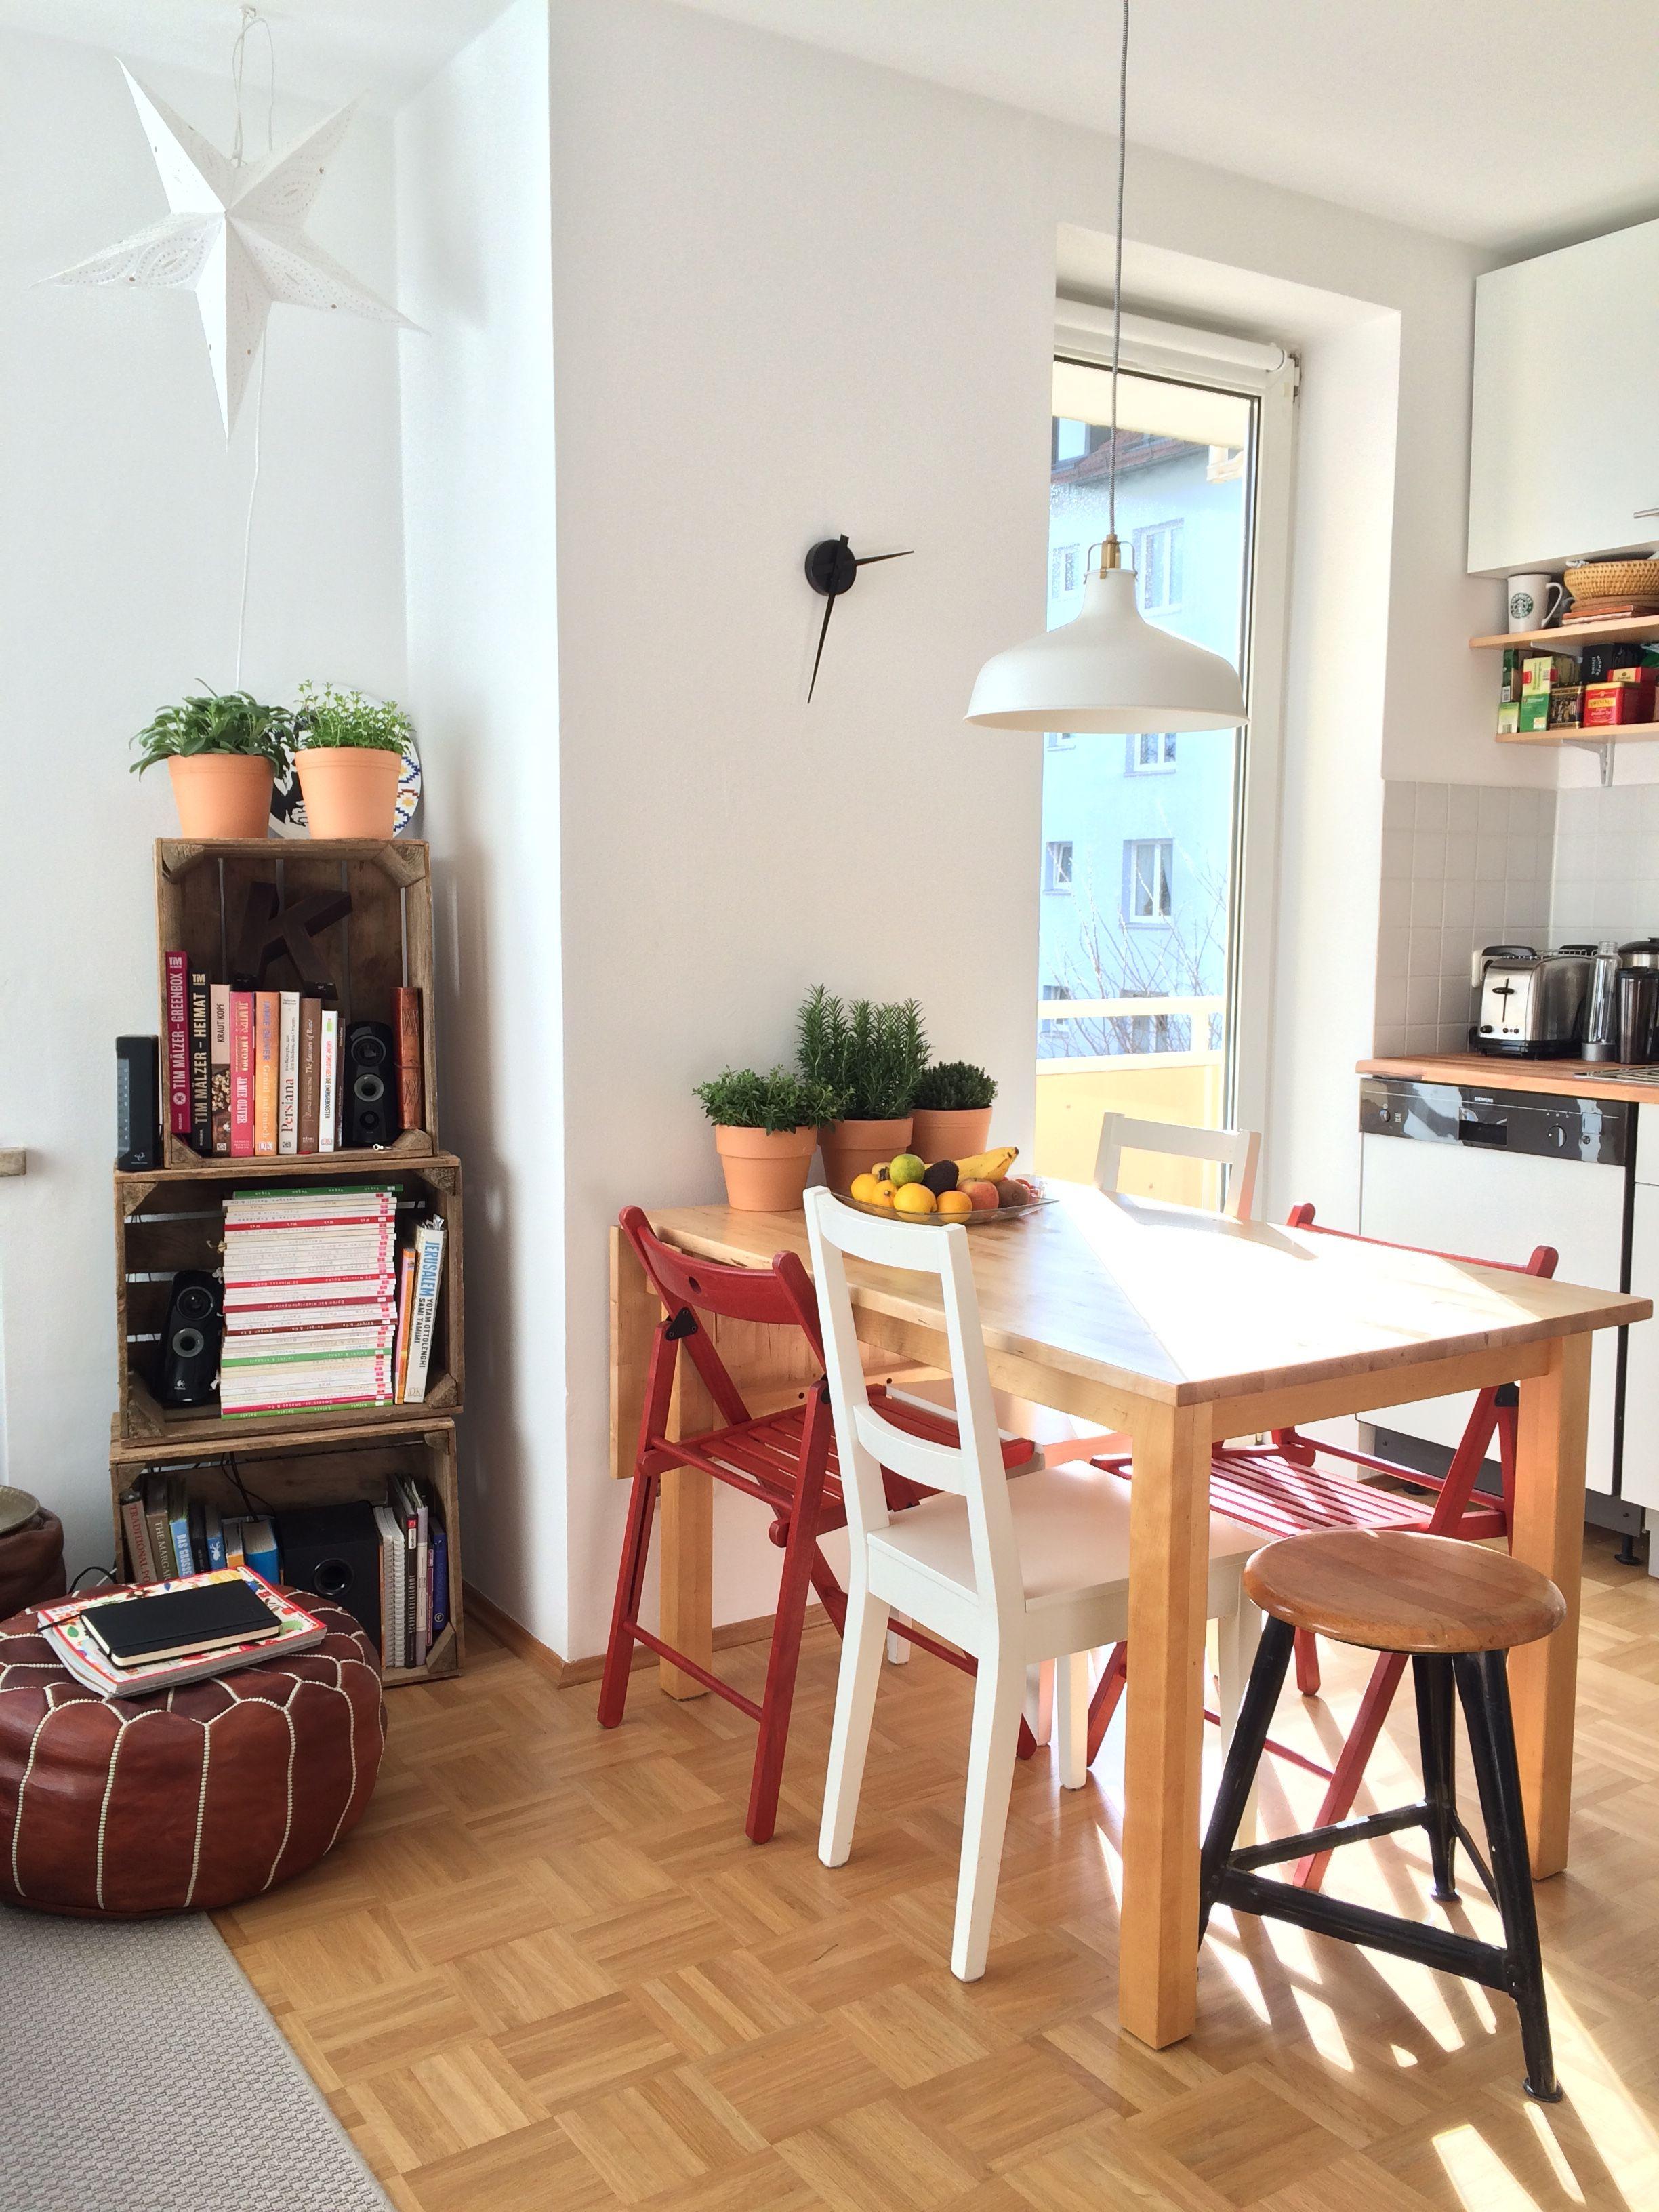 How to decorate small apartments. #tiny #oneroom #interior © B.K. 2016